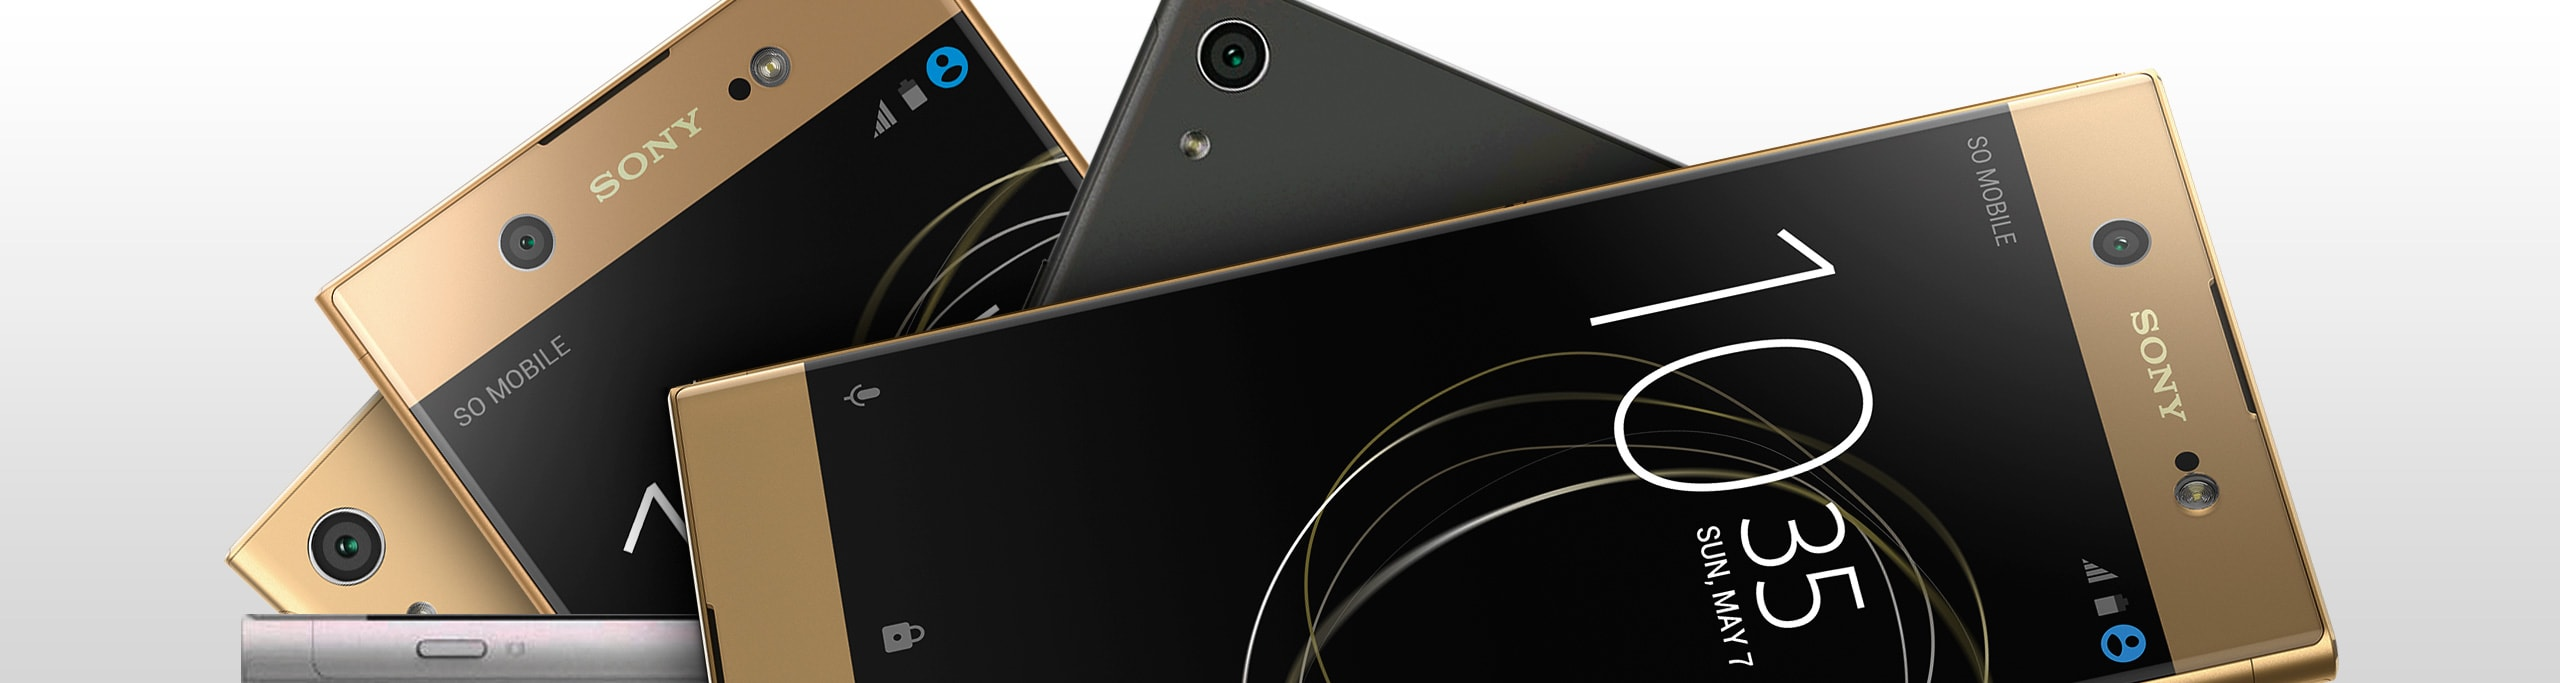 XA1 Ultra (G3221)